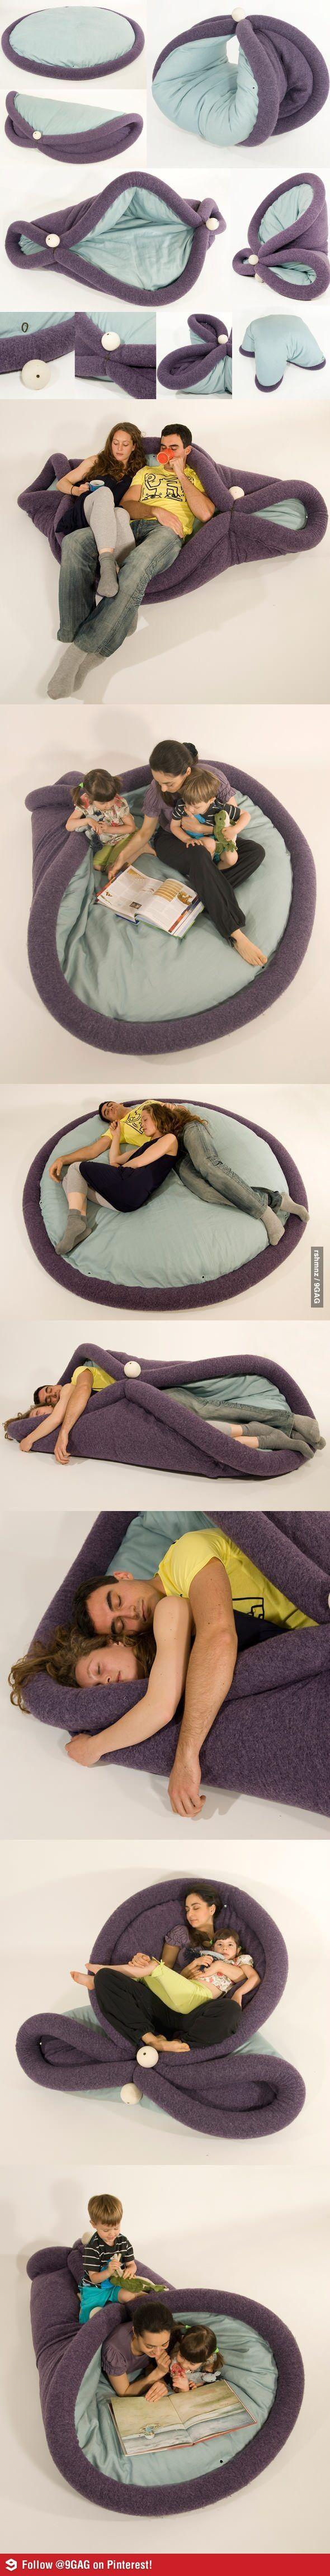 MUST HAVE: Original Carpet Pillow